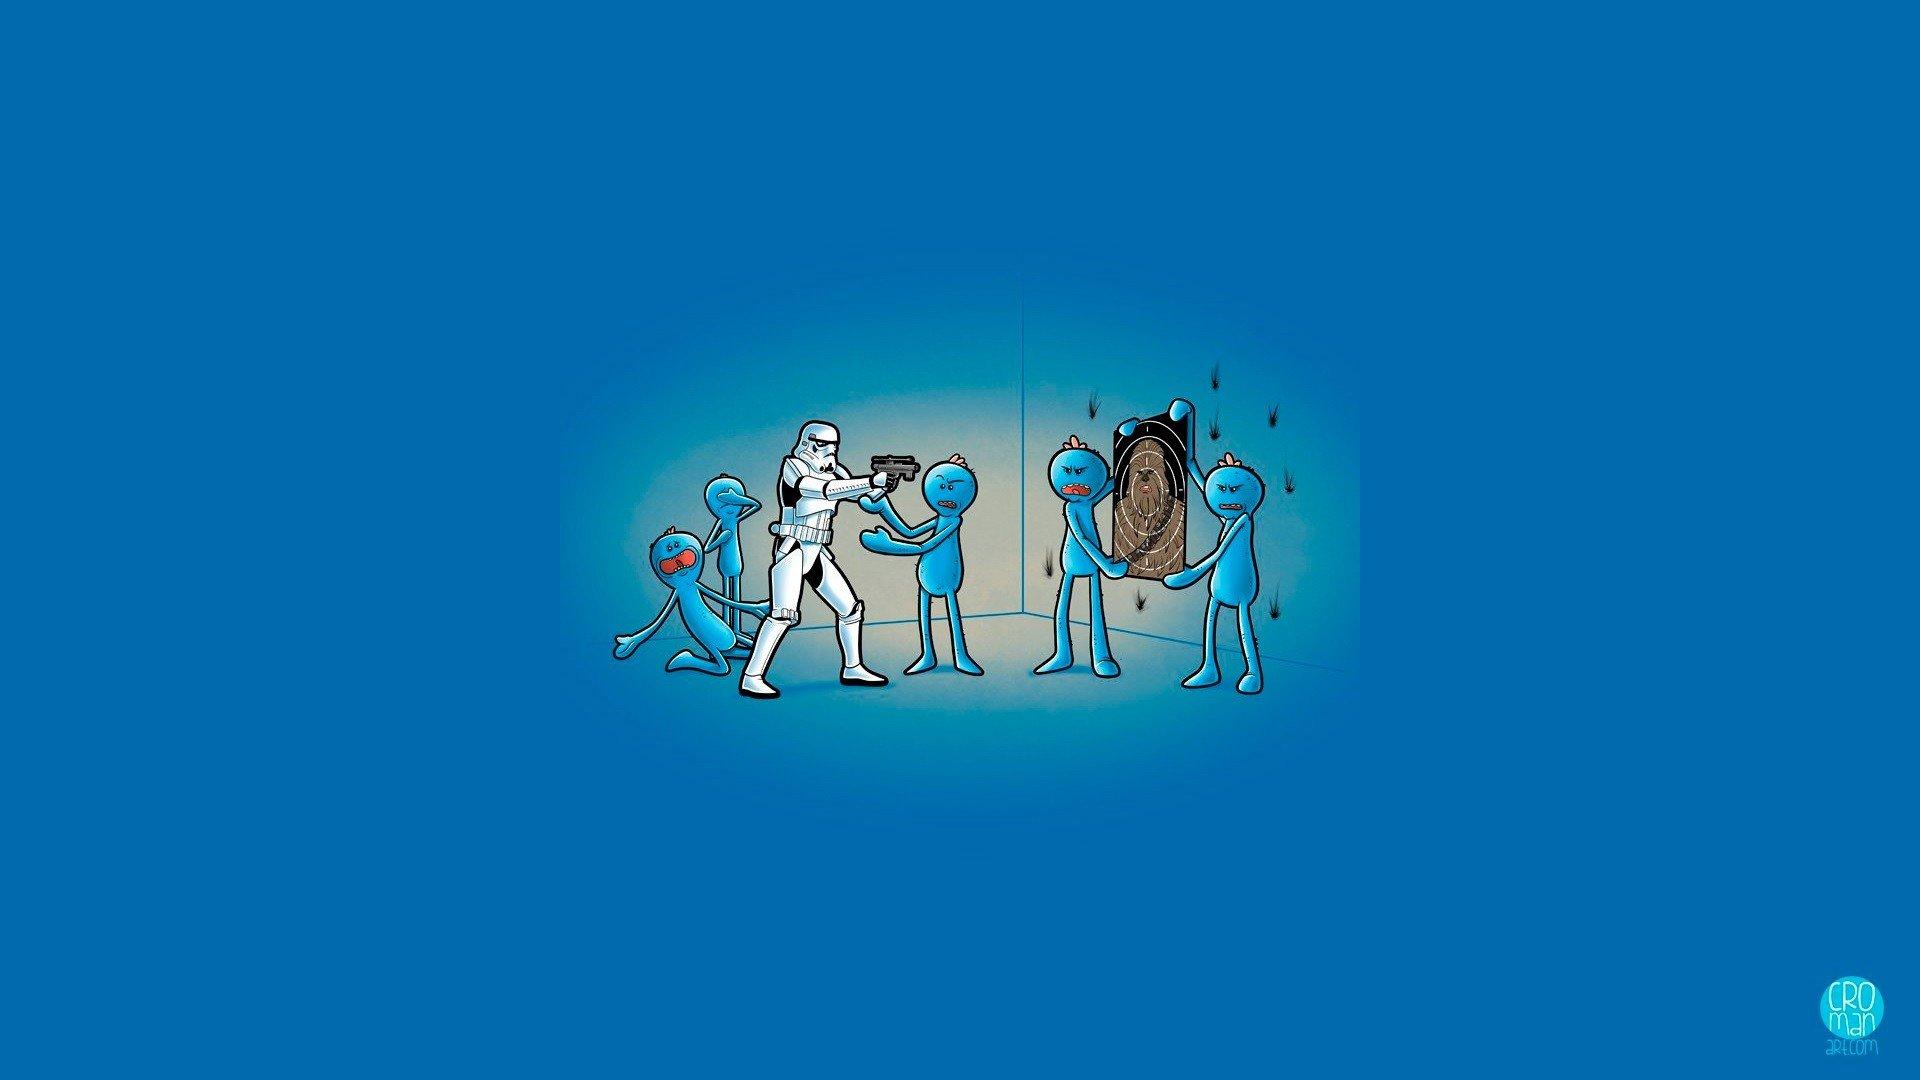 Fondos De Pantalla 1920x1080 Px Azul Chewbacca Humor